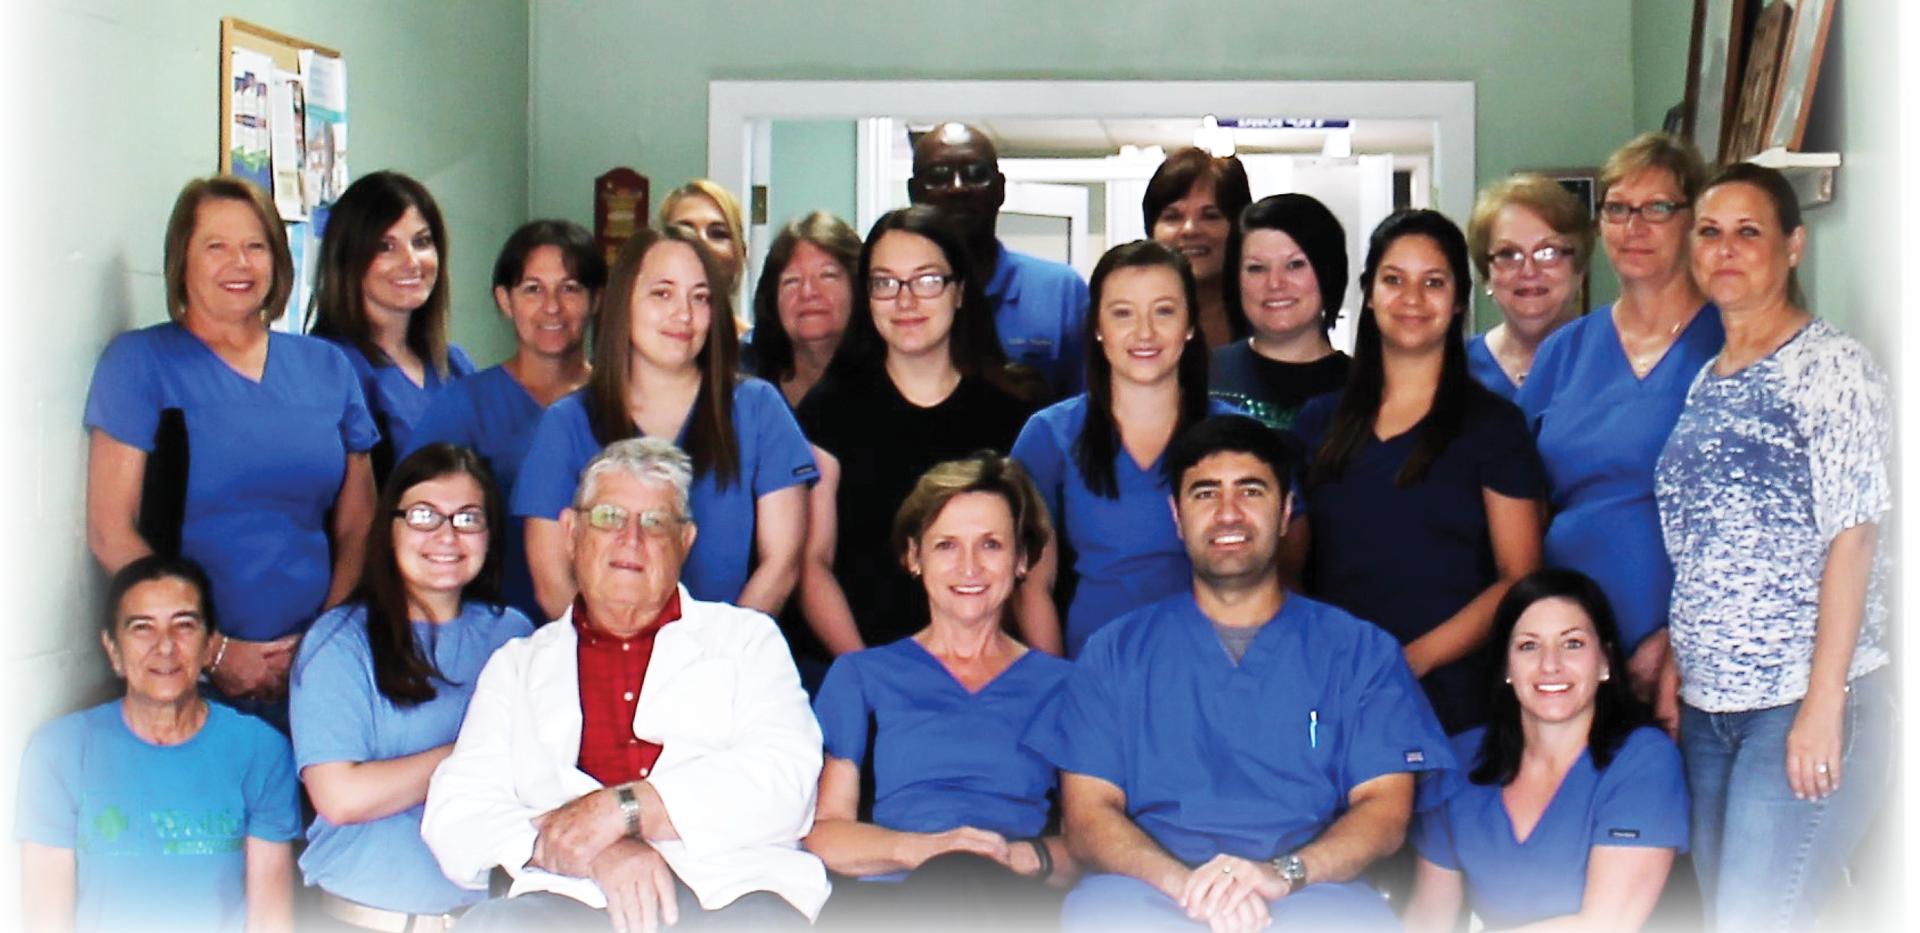 Wolfe's Pharmacy team photo